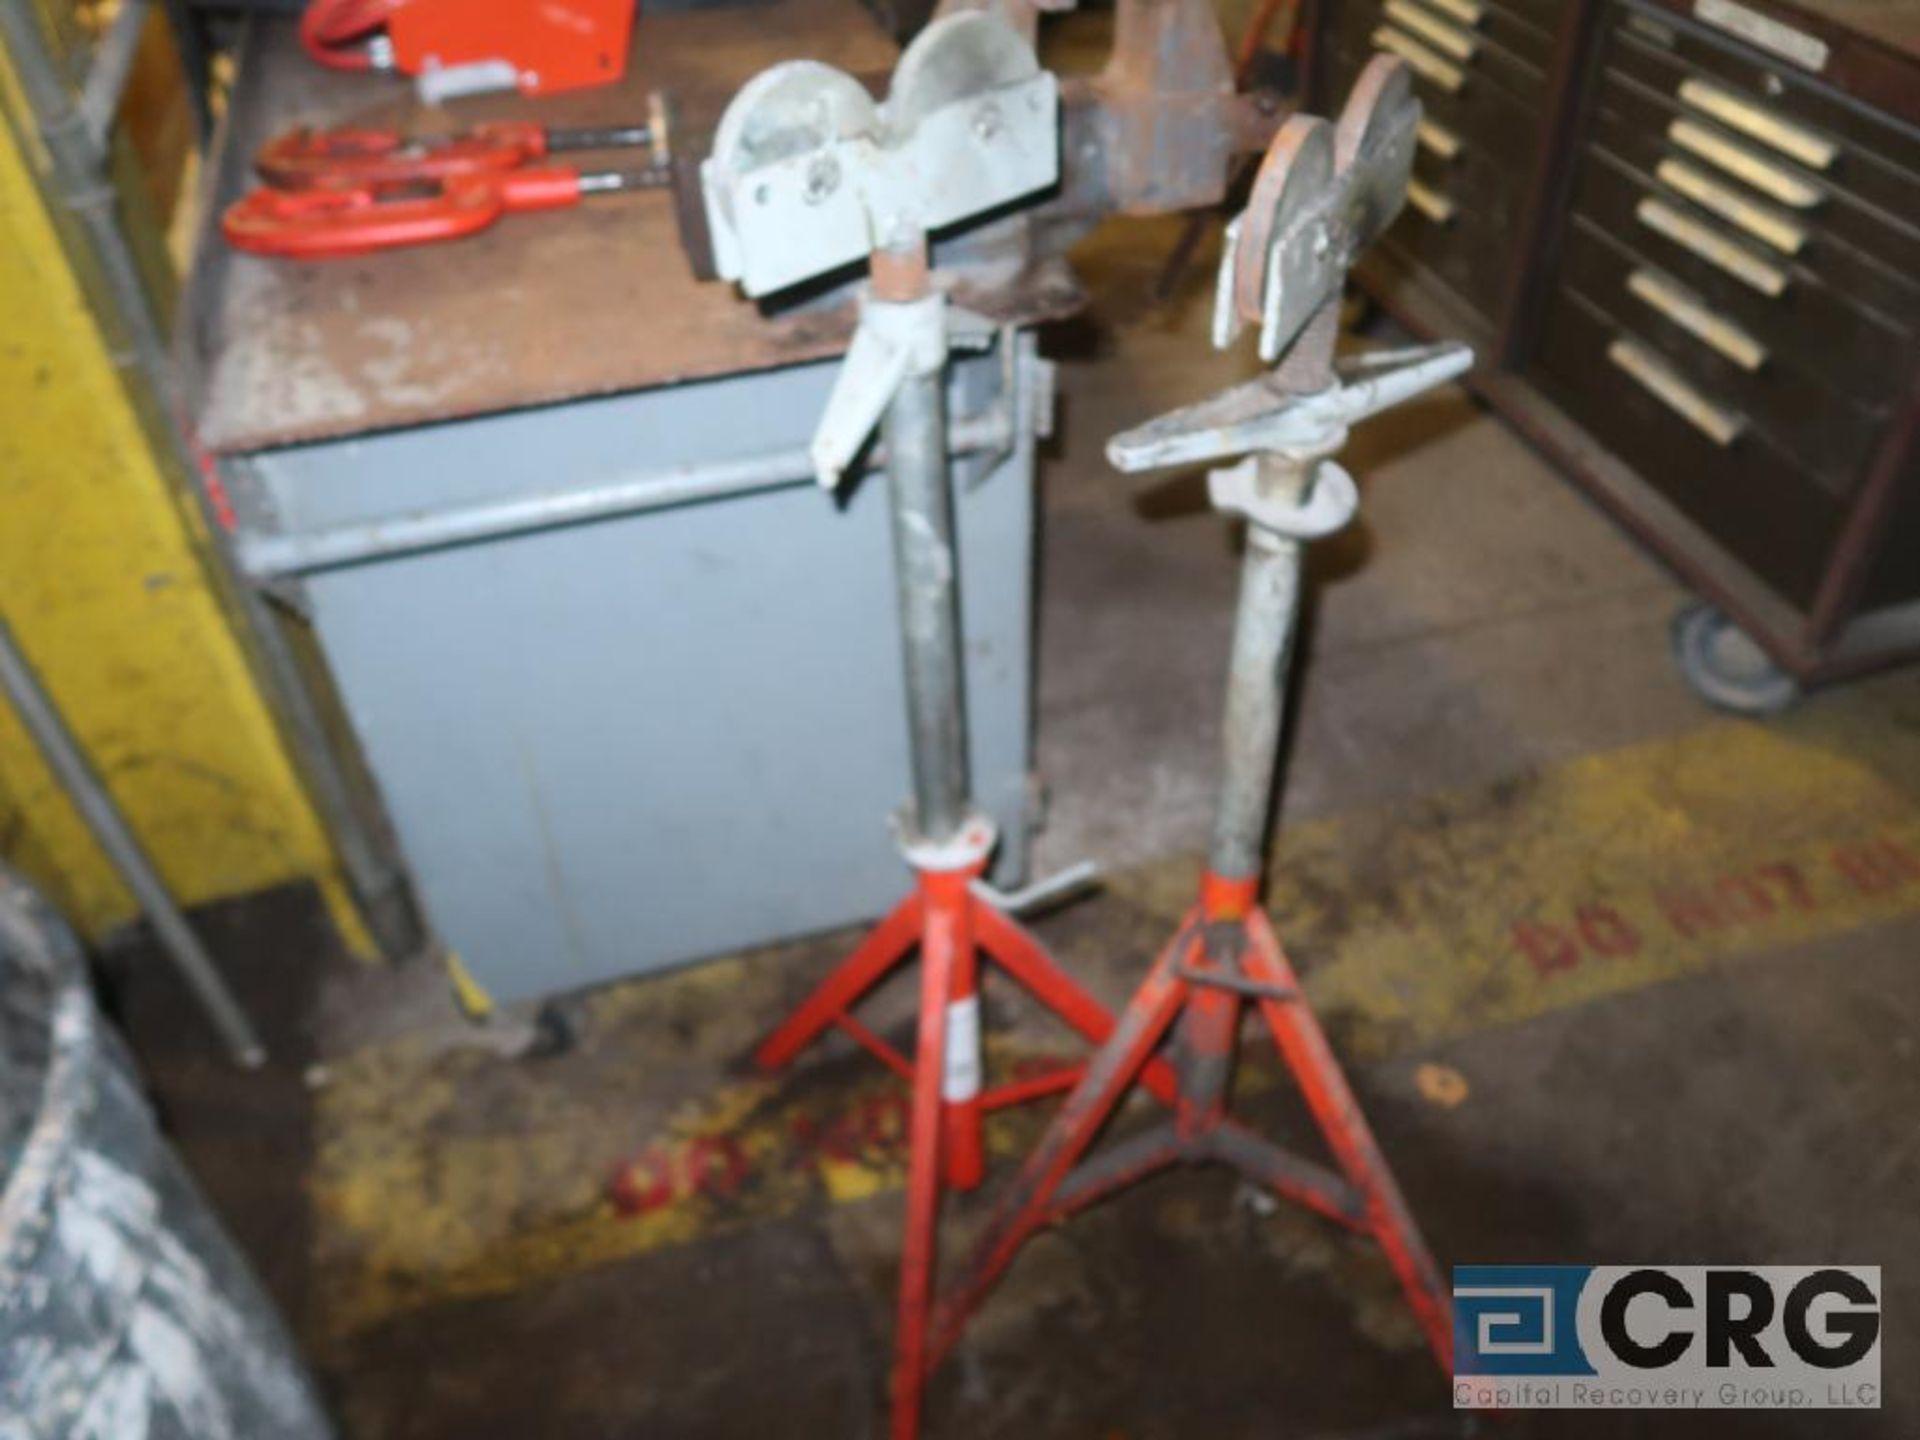 Lot of Ridgid threading tools including (1) model 600 electric handheld, (1) manual set, (4) - Image 4 of 4